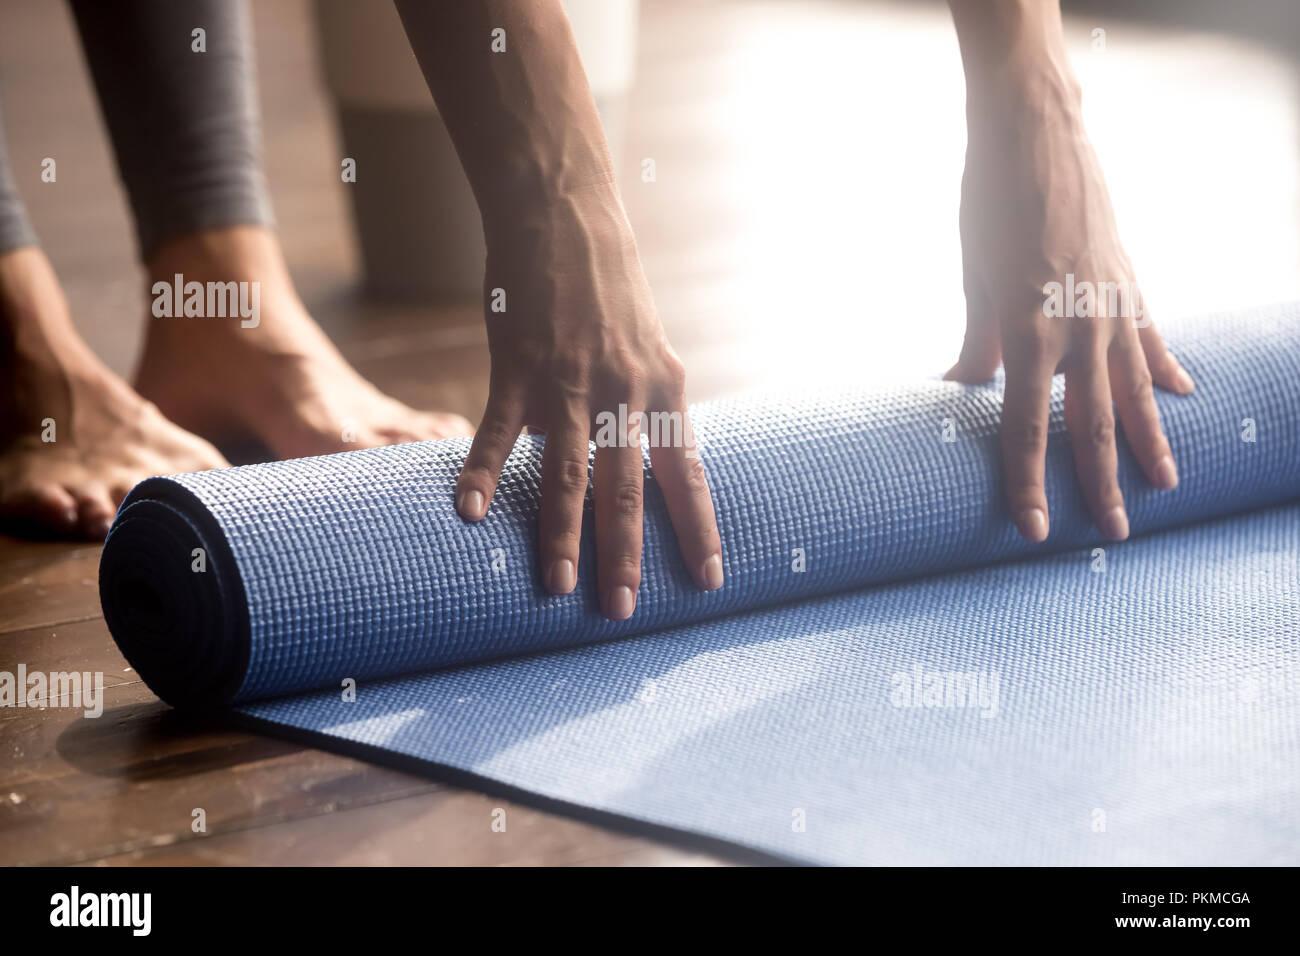 Blue Fitness Trainingsmatte, Ausrüstungen für Sport Training Stockbild